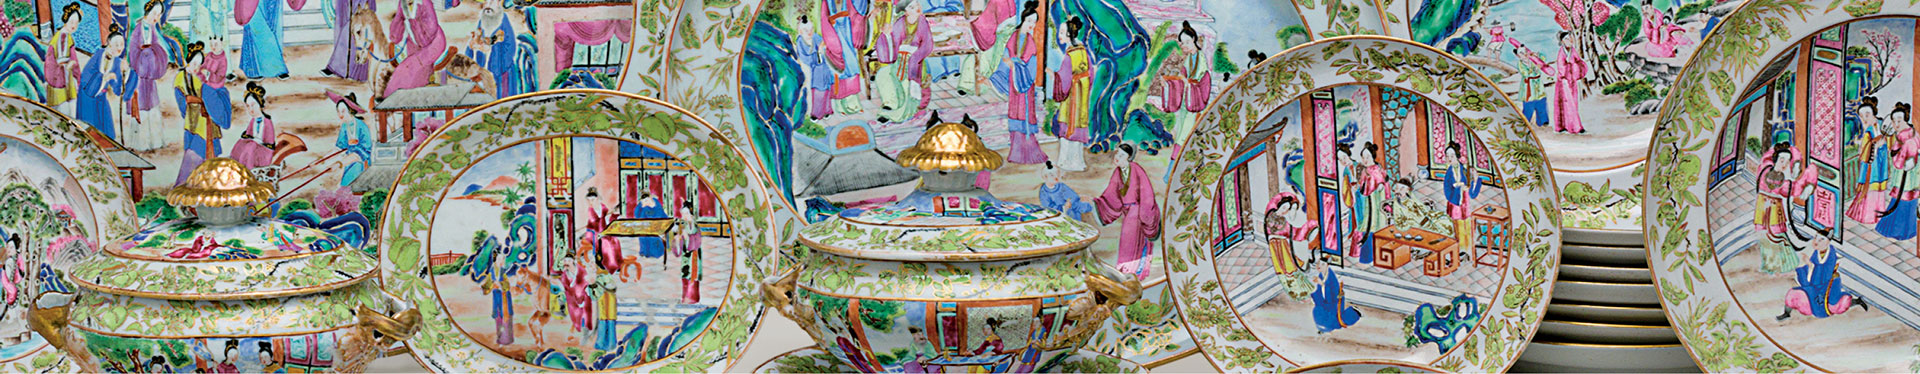 European-Ceramics-Glass-Chinese-Export-banner-FINAL_25_1_20170124125721.jpg